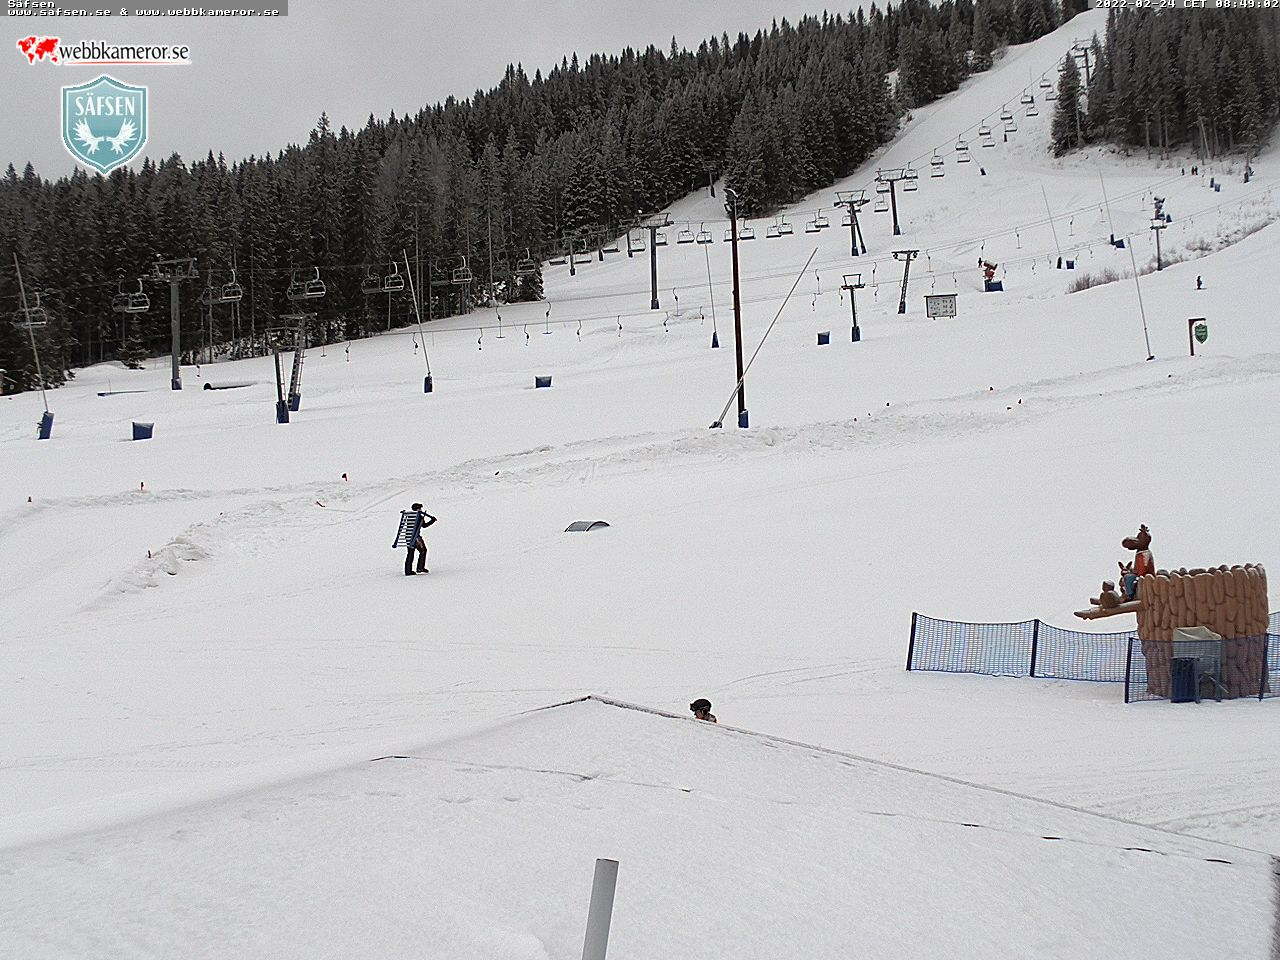 Webcam Fredriksberg, Ludvika, Dalarna, Schweden